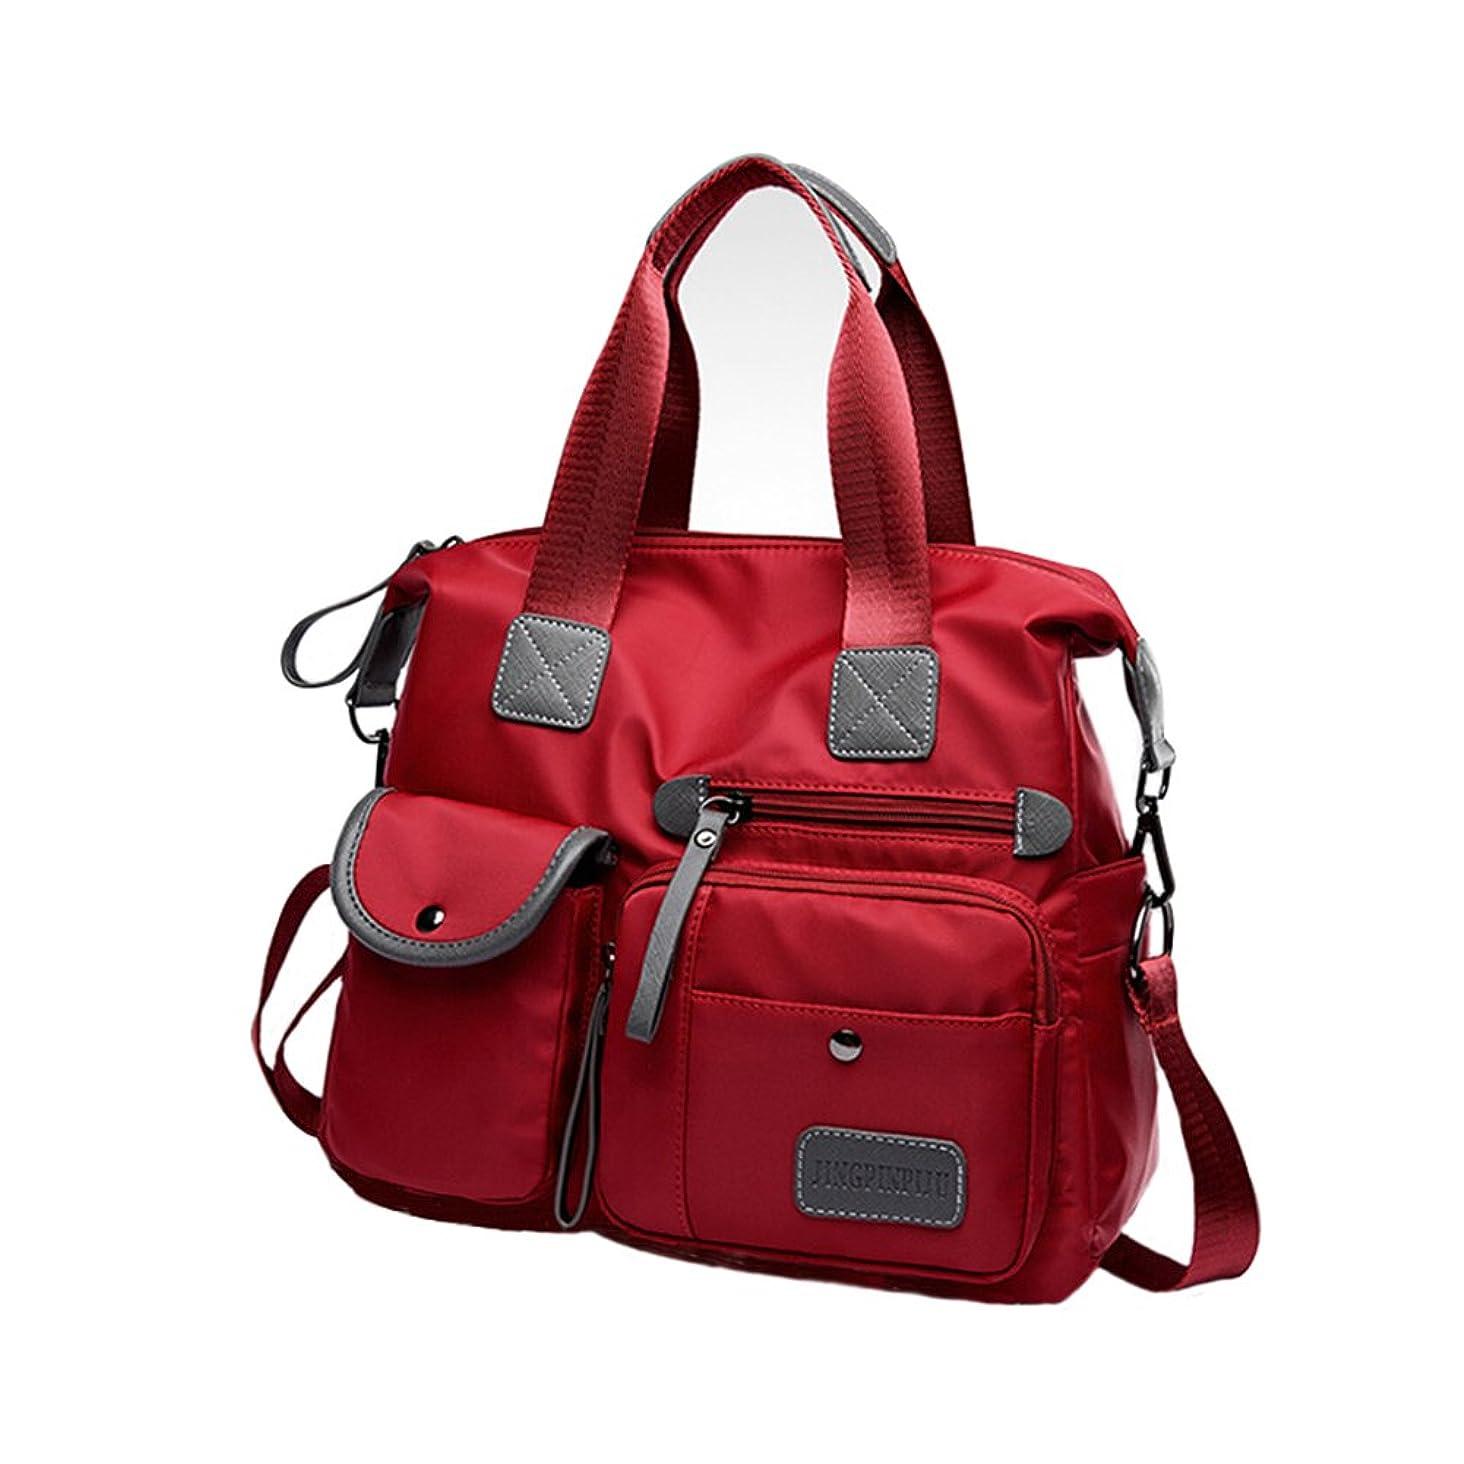 Multifunctional Oxford Cloth Ladies Handbag High-Capacity Nylon One-Shoulder Backpack